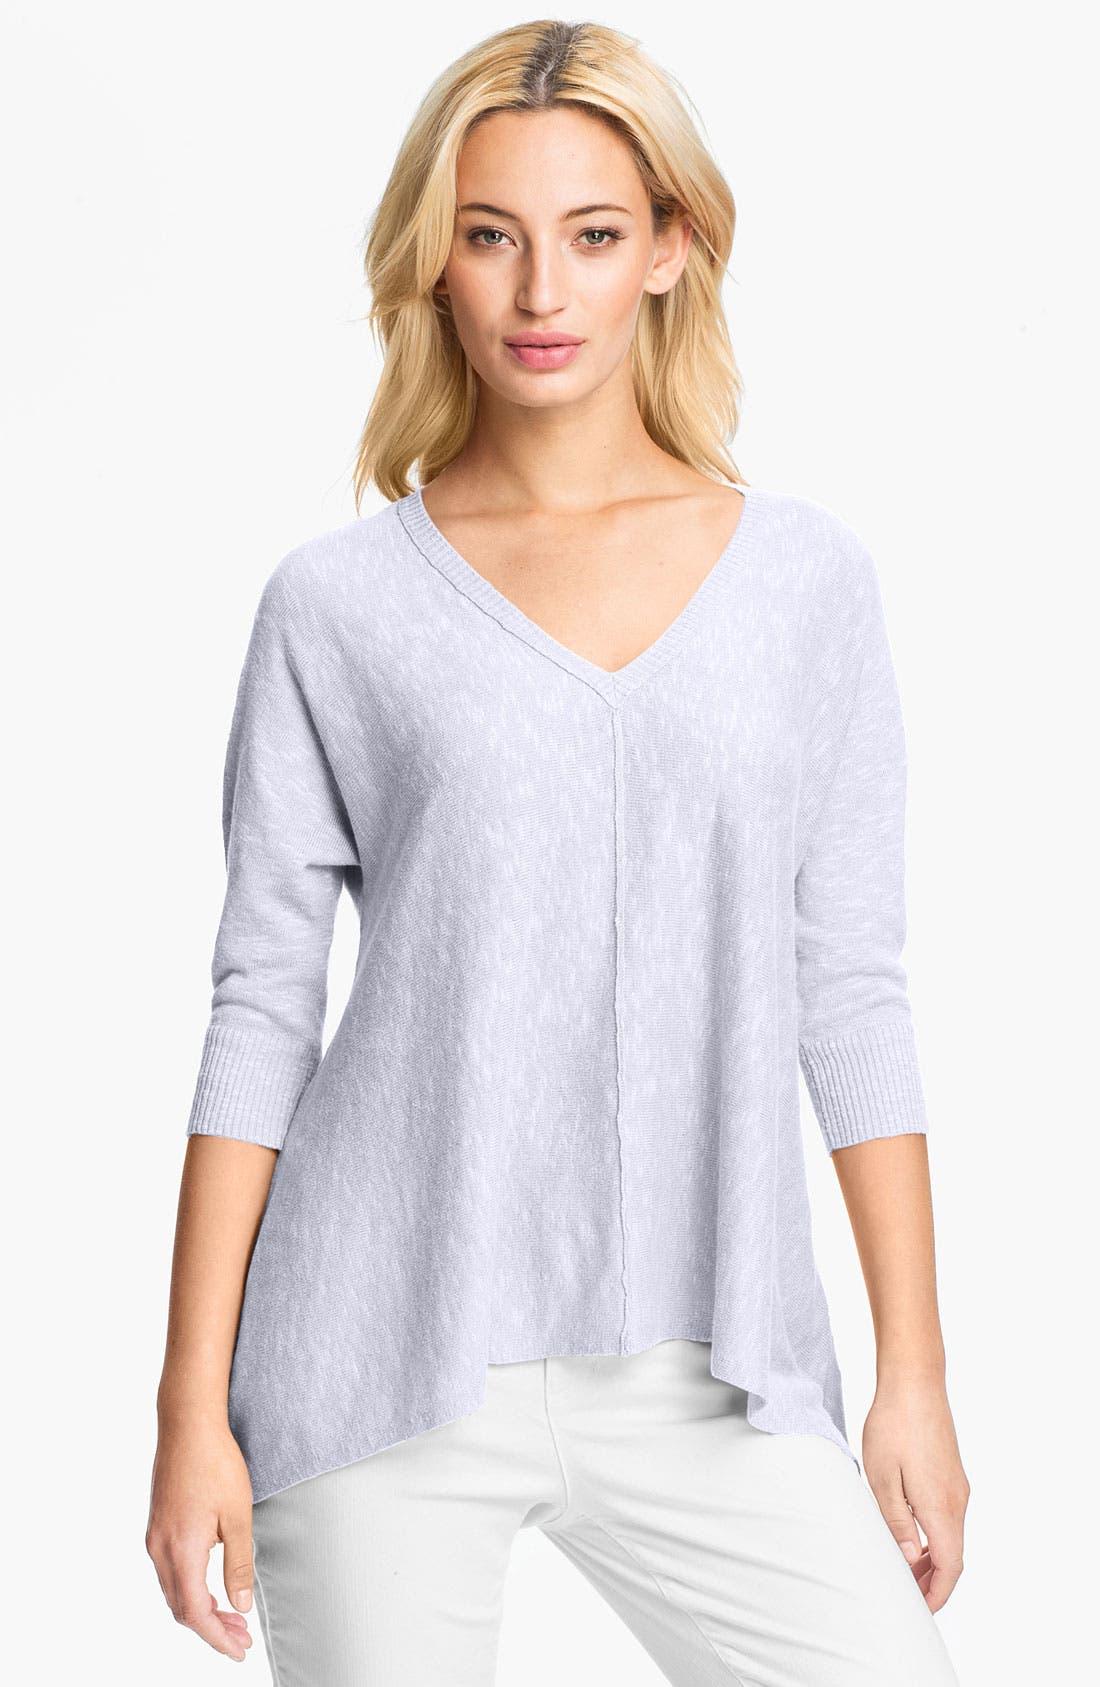 Alternate Image 1 Selected - Eileen Fisher Linen & Cotton V-Neck Top